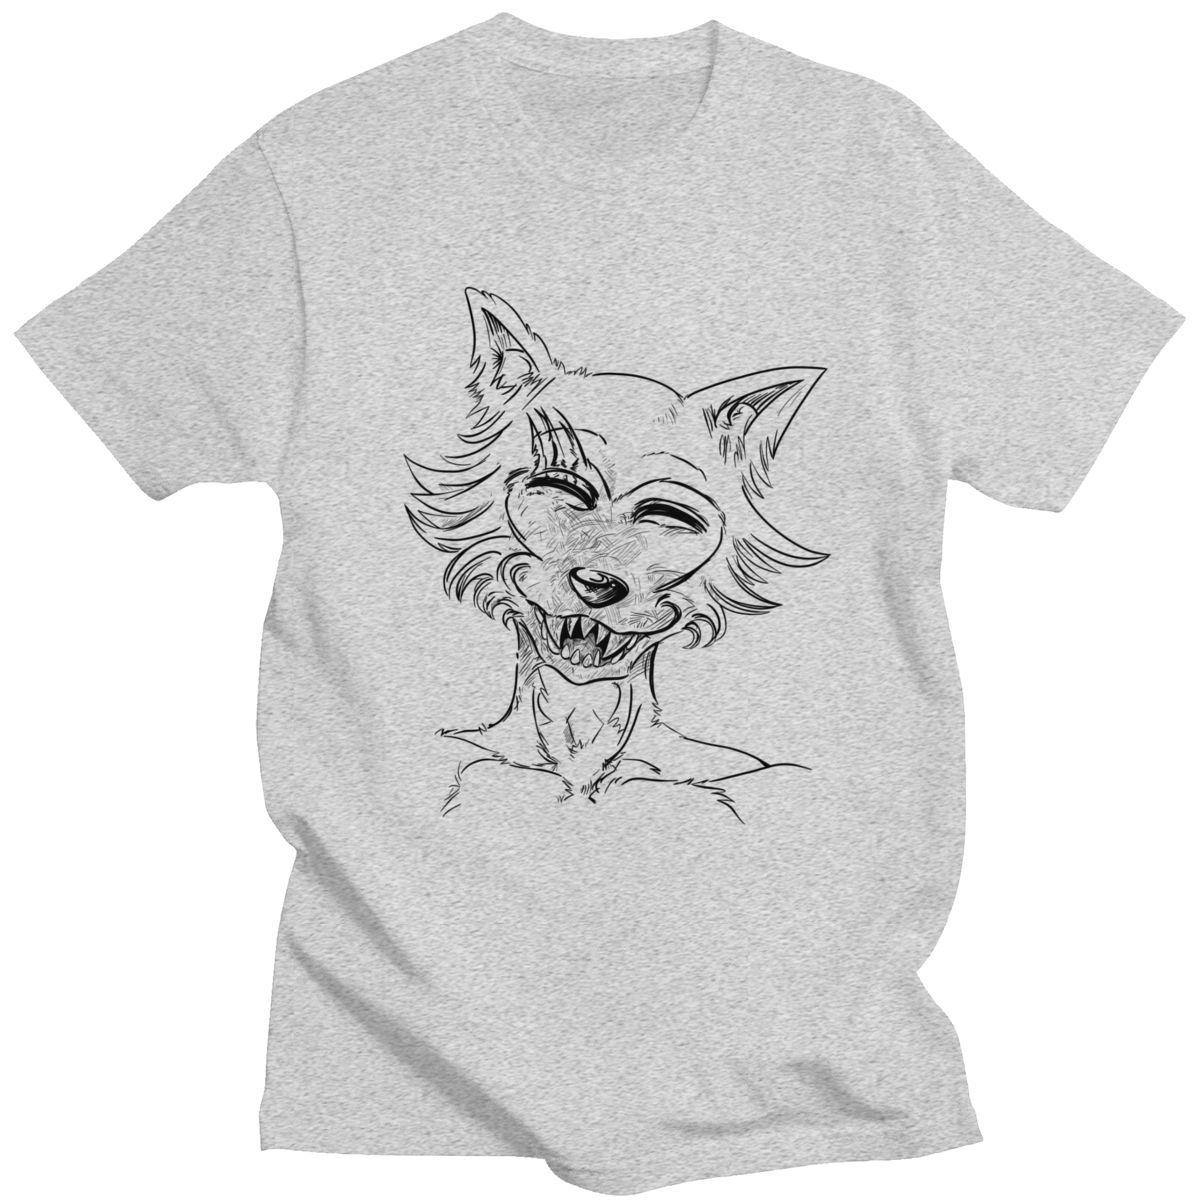 Divertente Beastars T-shirt per uomo cotone Tshirt Anime Animal Lupo Coniglio Furry Manga Short Sleeve Tee Shirt Graphic Tops Merch regalo